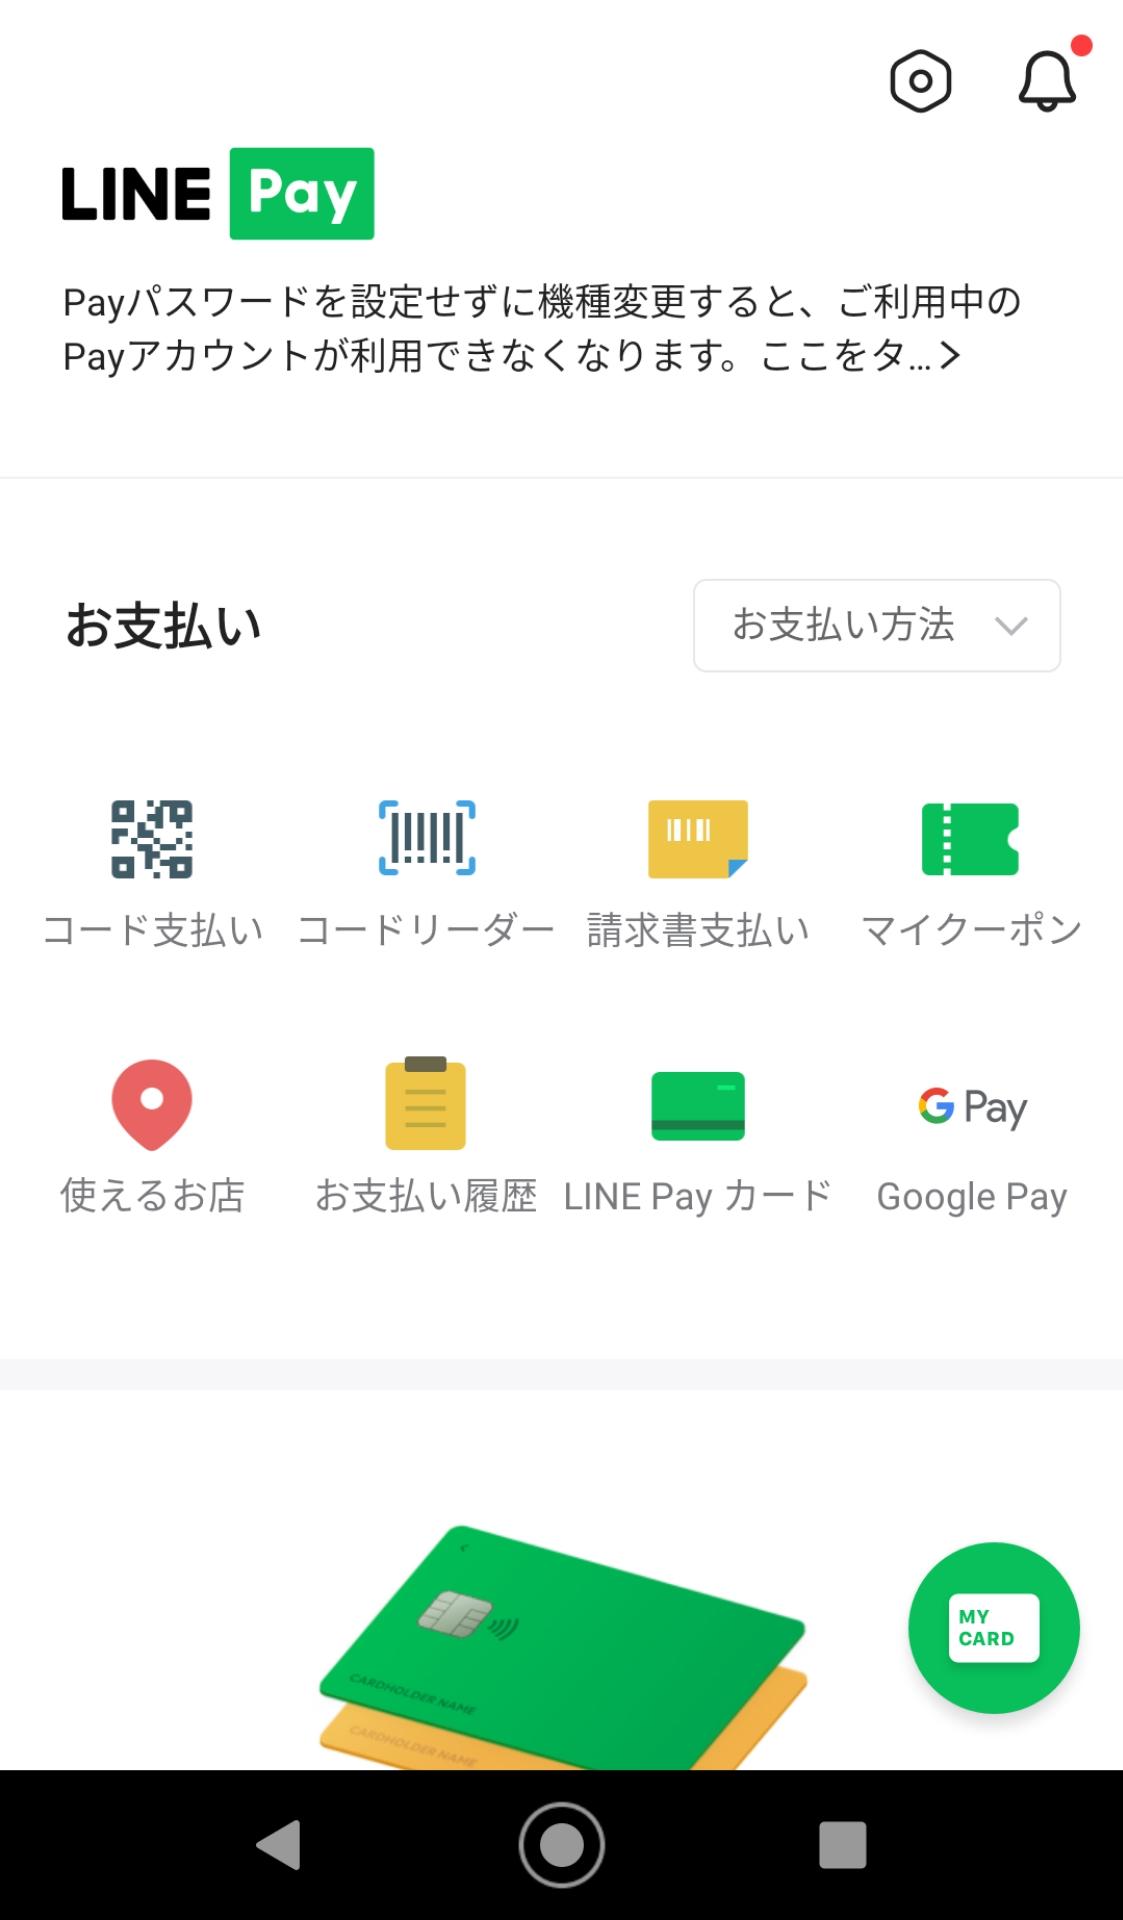 LINEPay トップ画面